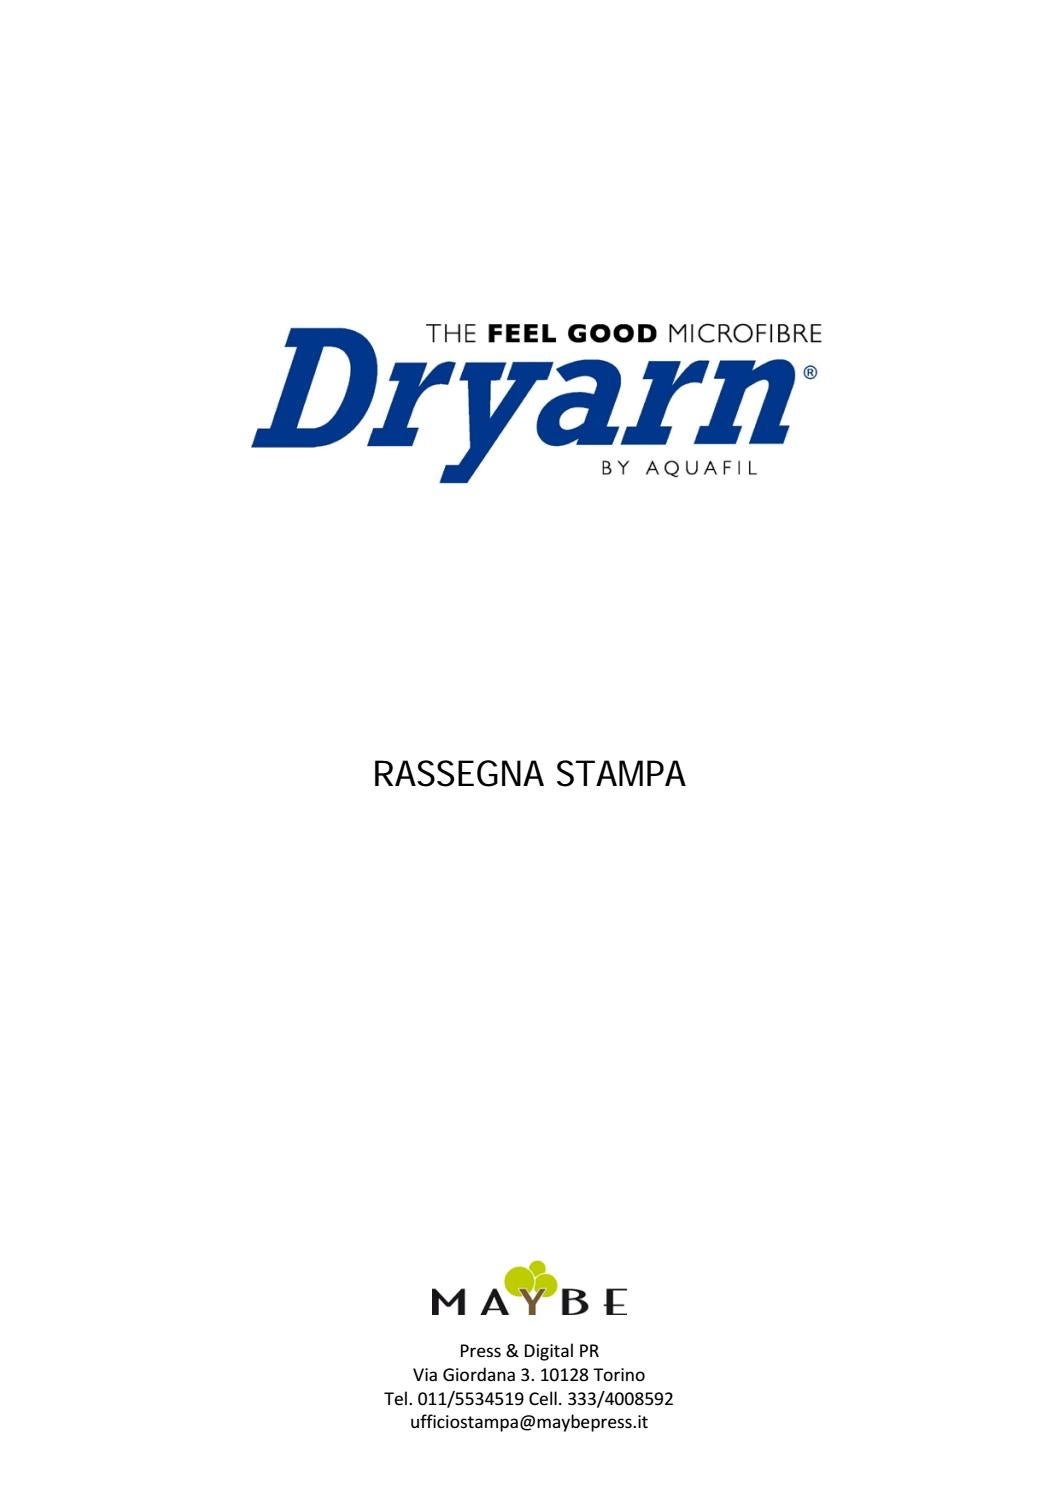 Dryarn Rassegna Stampa  lug2016 by maybe ufficio stampa - issuu 8fda16f20594